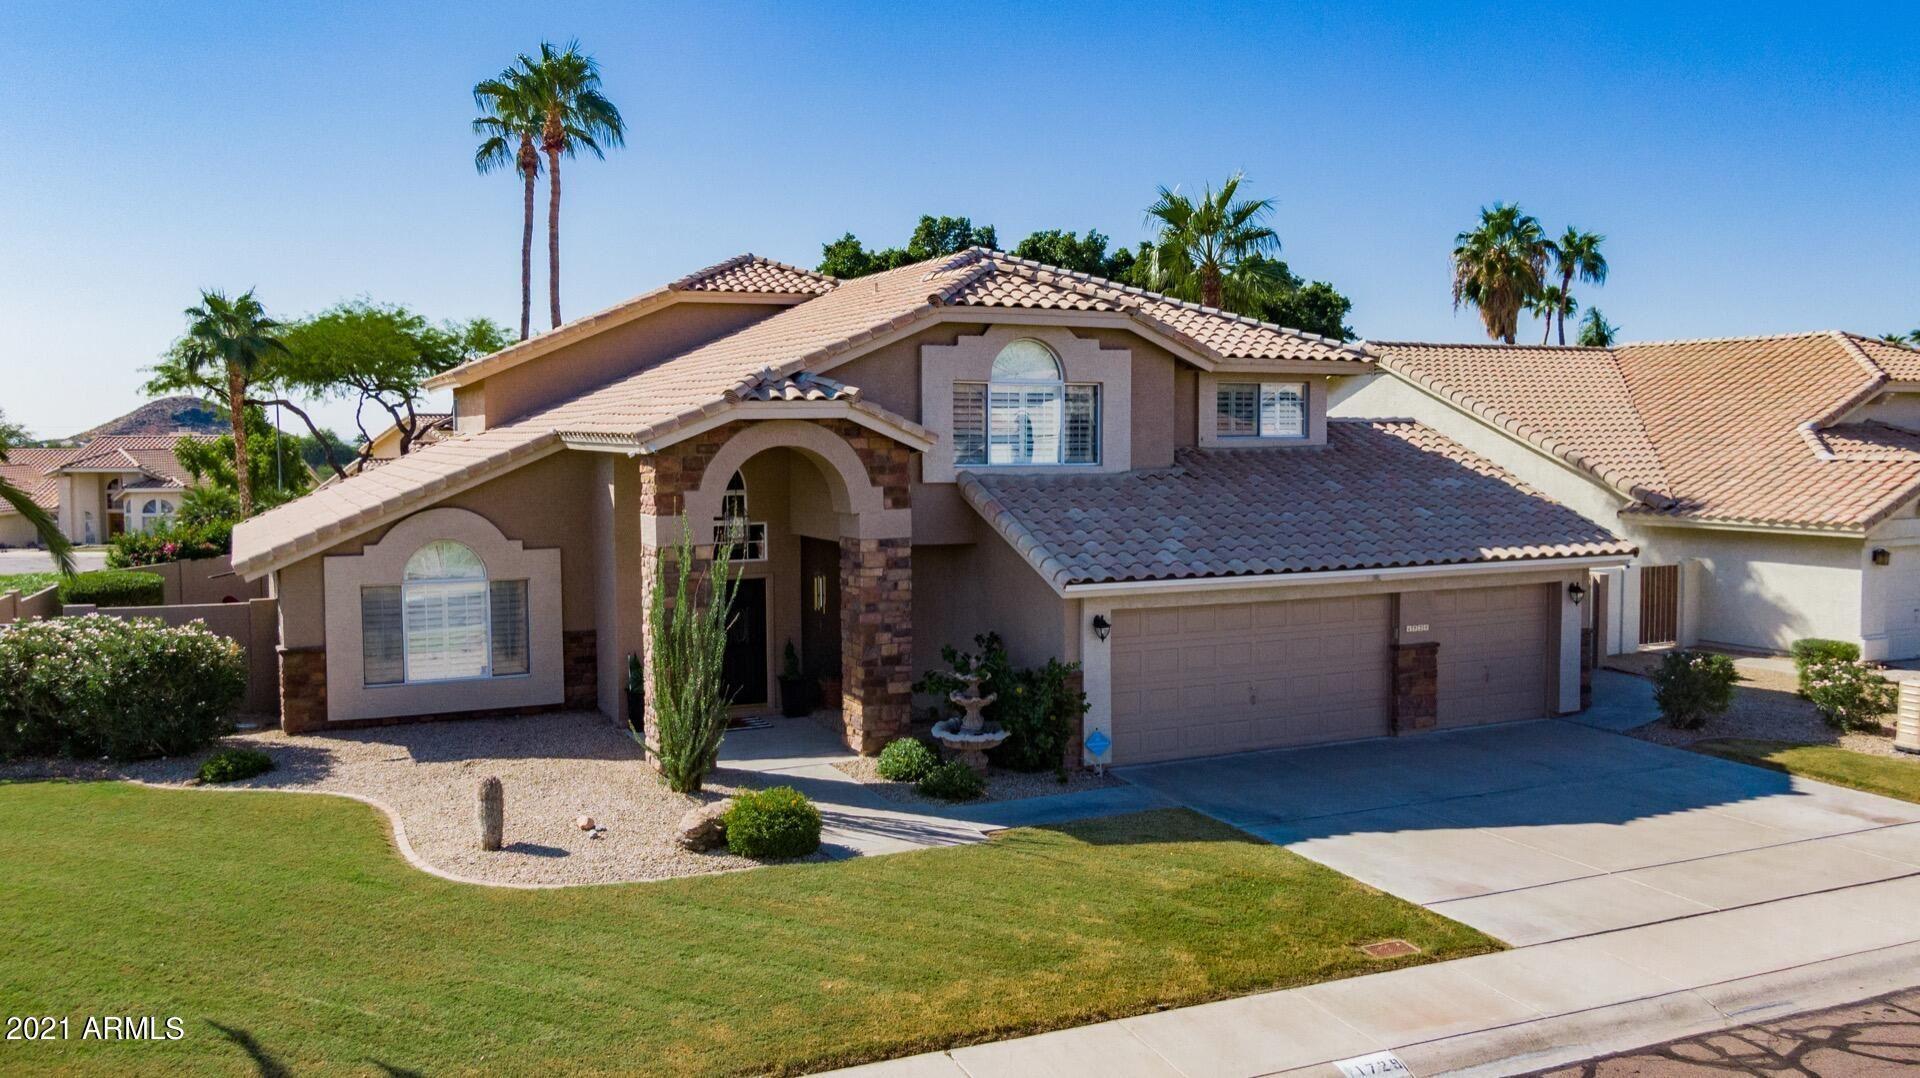 1729 E BROOKWOOD Court, Phoenix, AZ 85048 - MLS#: 6301372